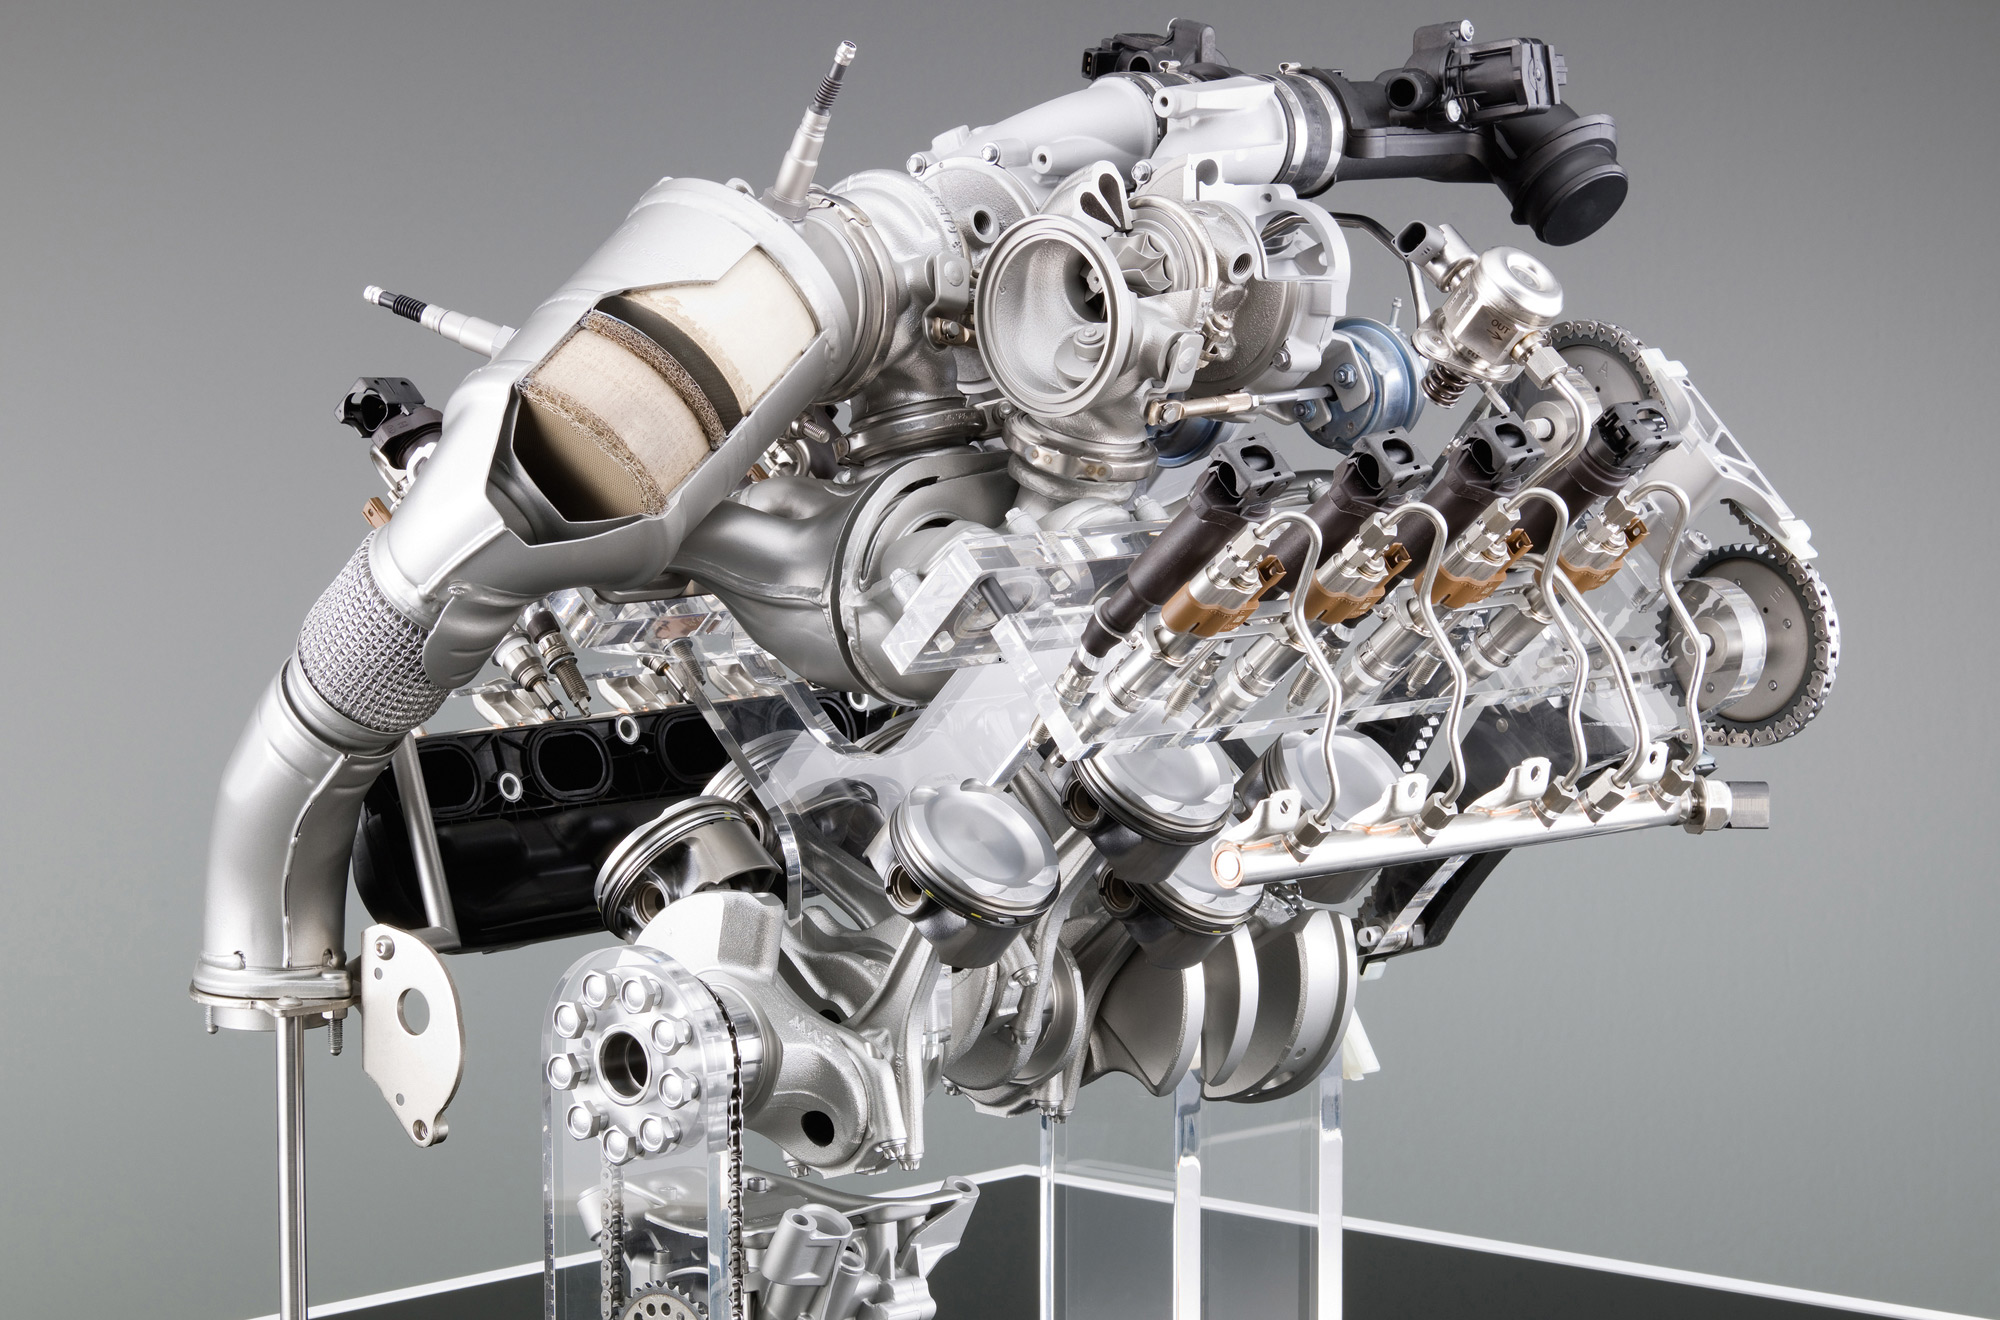 Bmw X M Engine on Twin Scroll Turbo Diagram